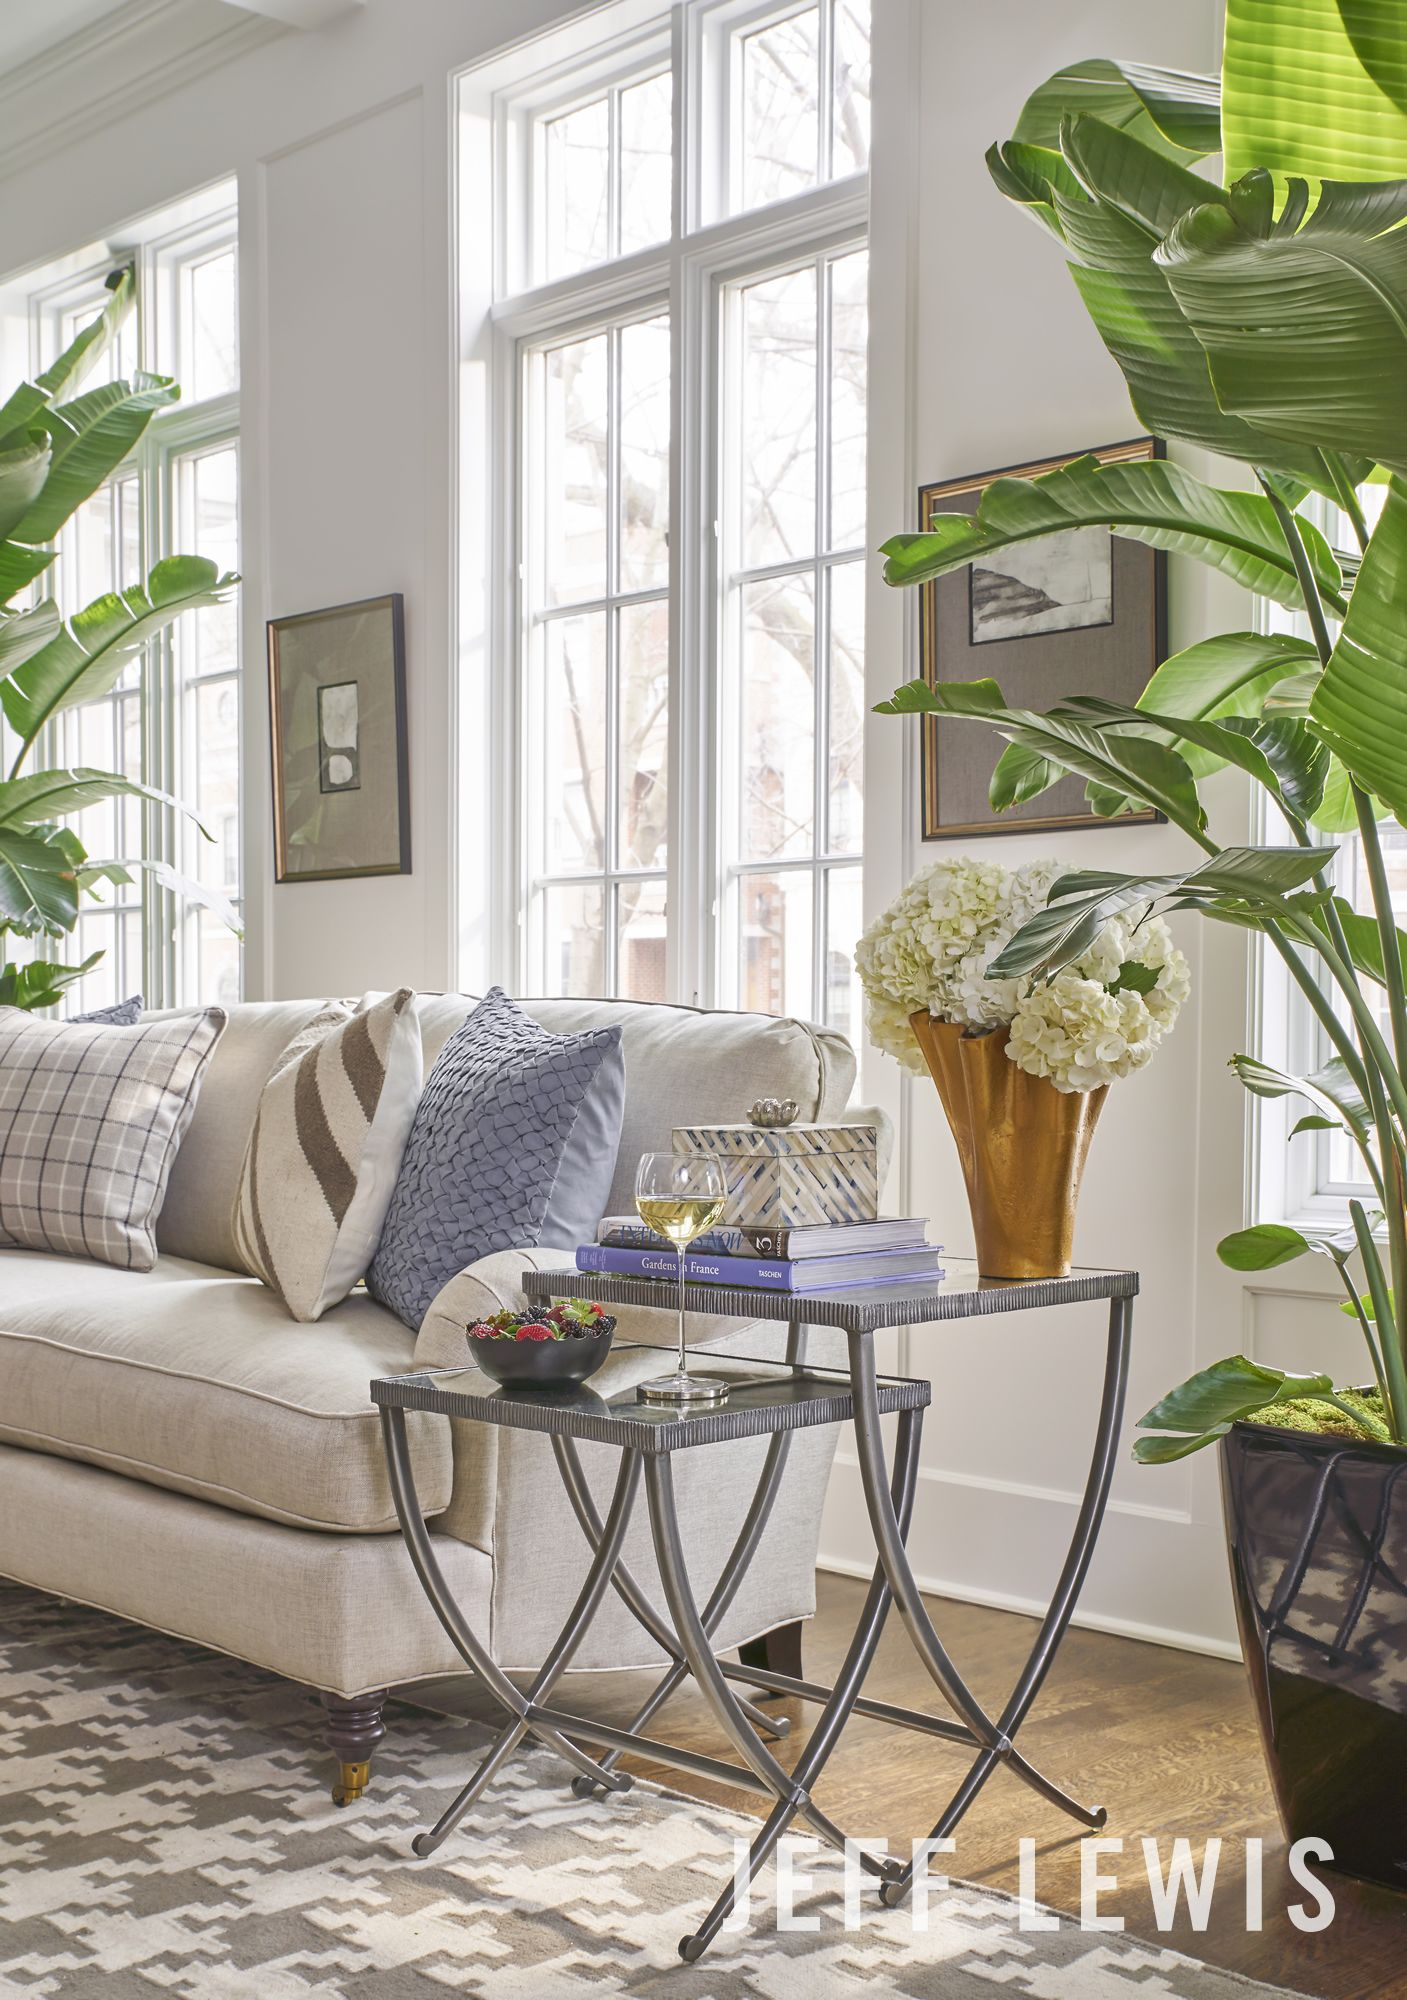 Our Story Rose Tarlow Melrose House Living Room Design Modern